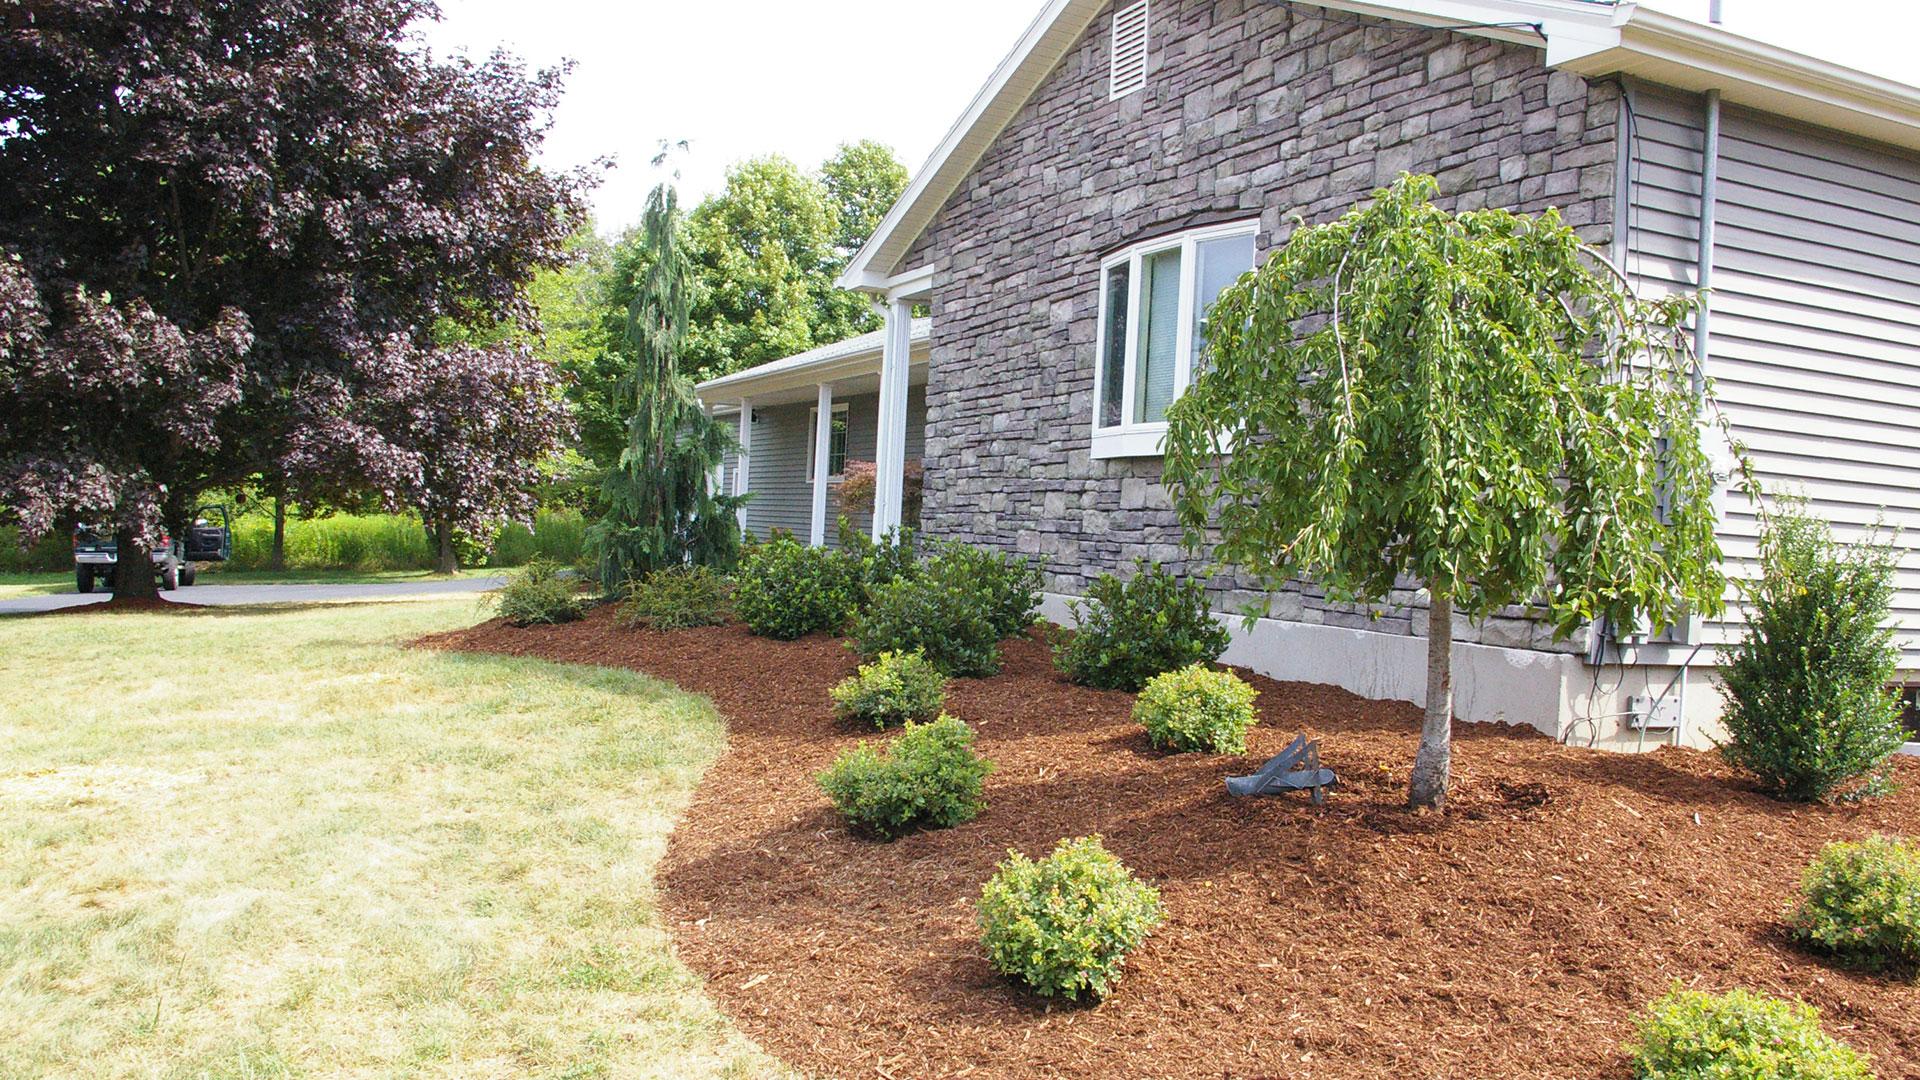 Foundation Plantings Land Designs Unlimited Llc